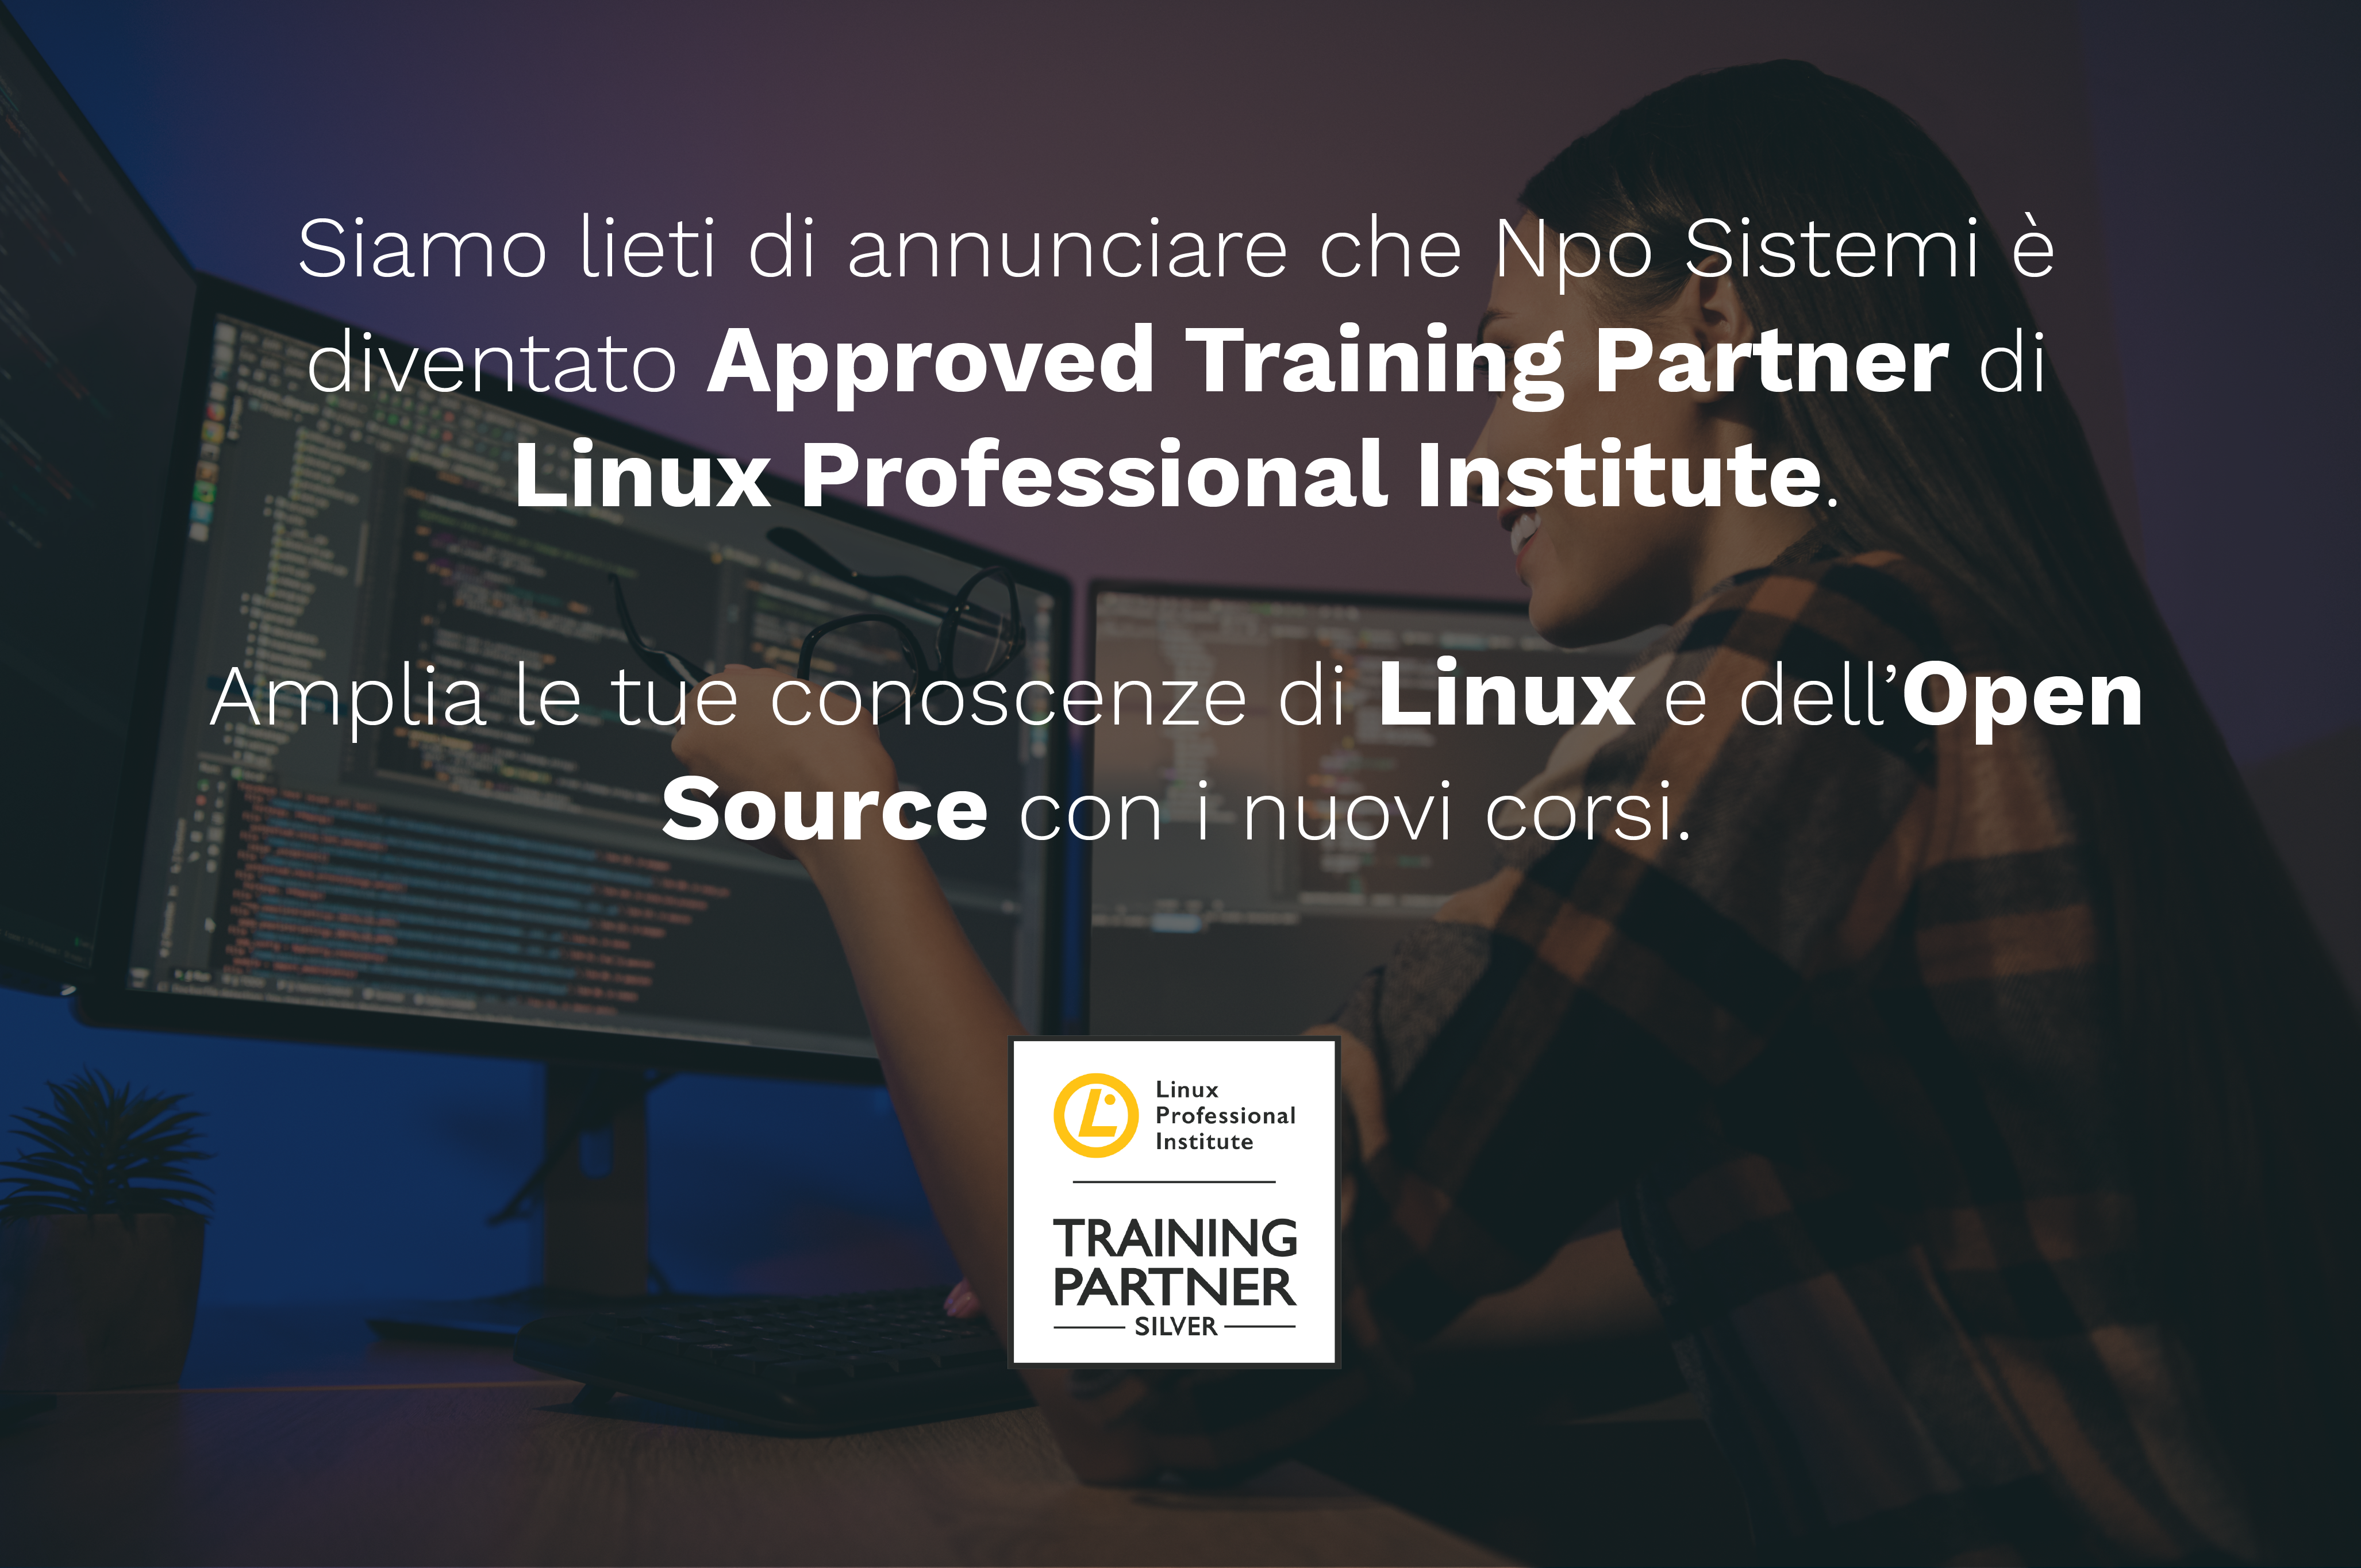 Linux – Npo è Approved Training Partner di LPI